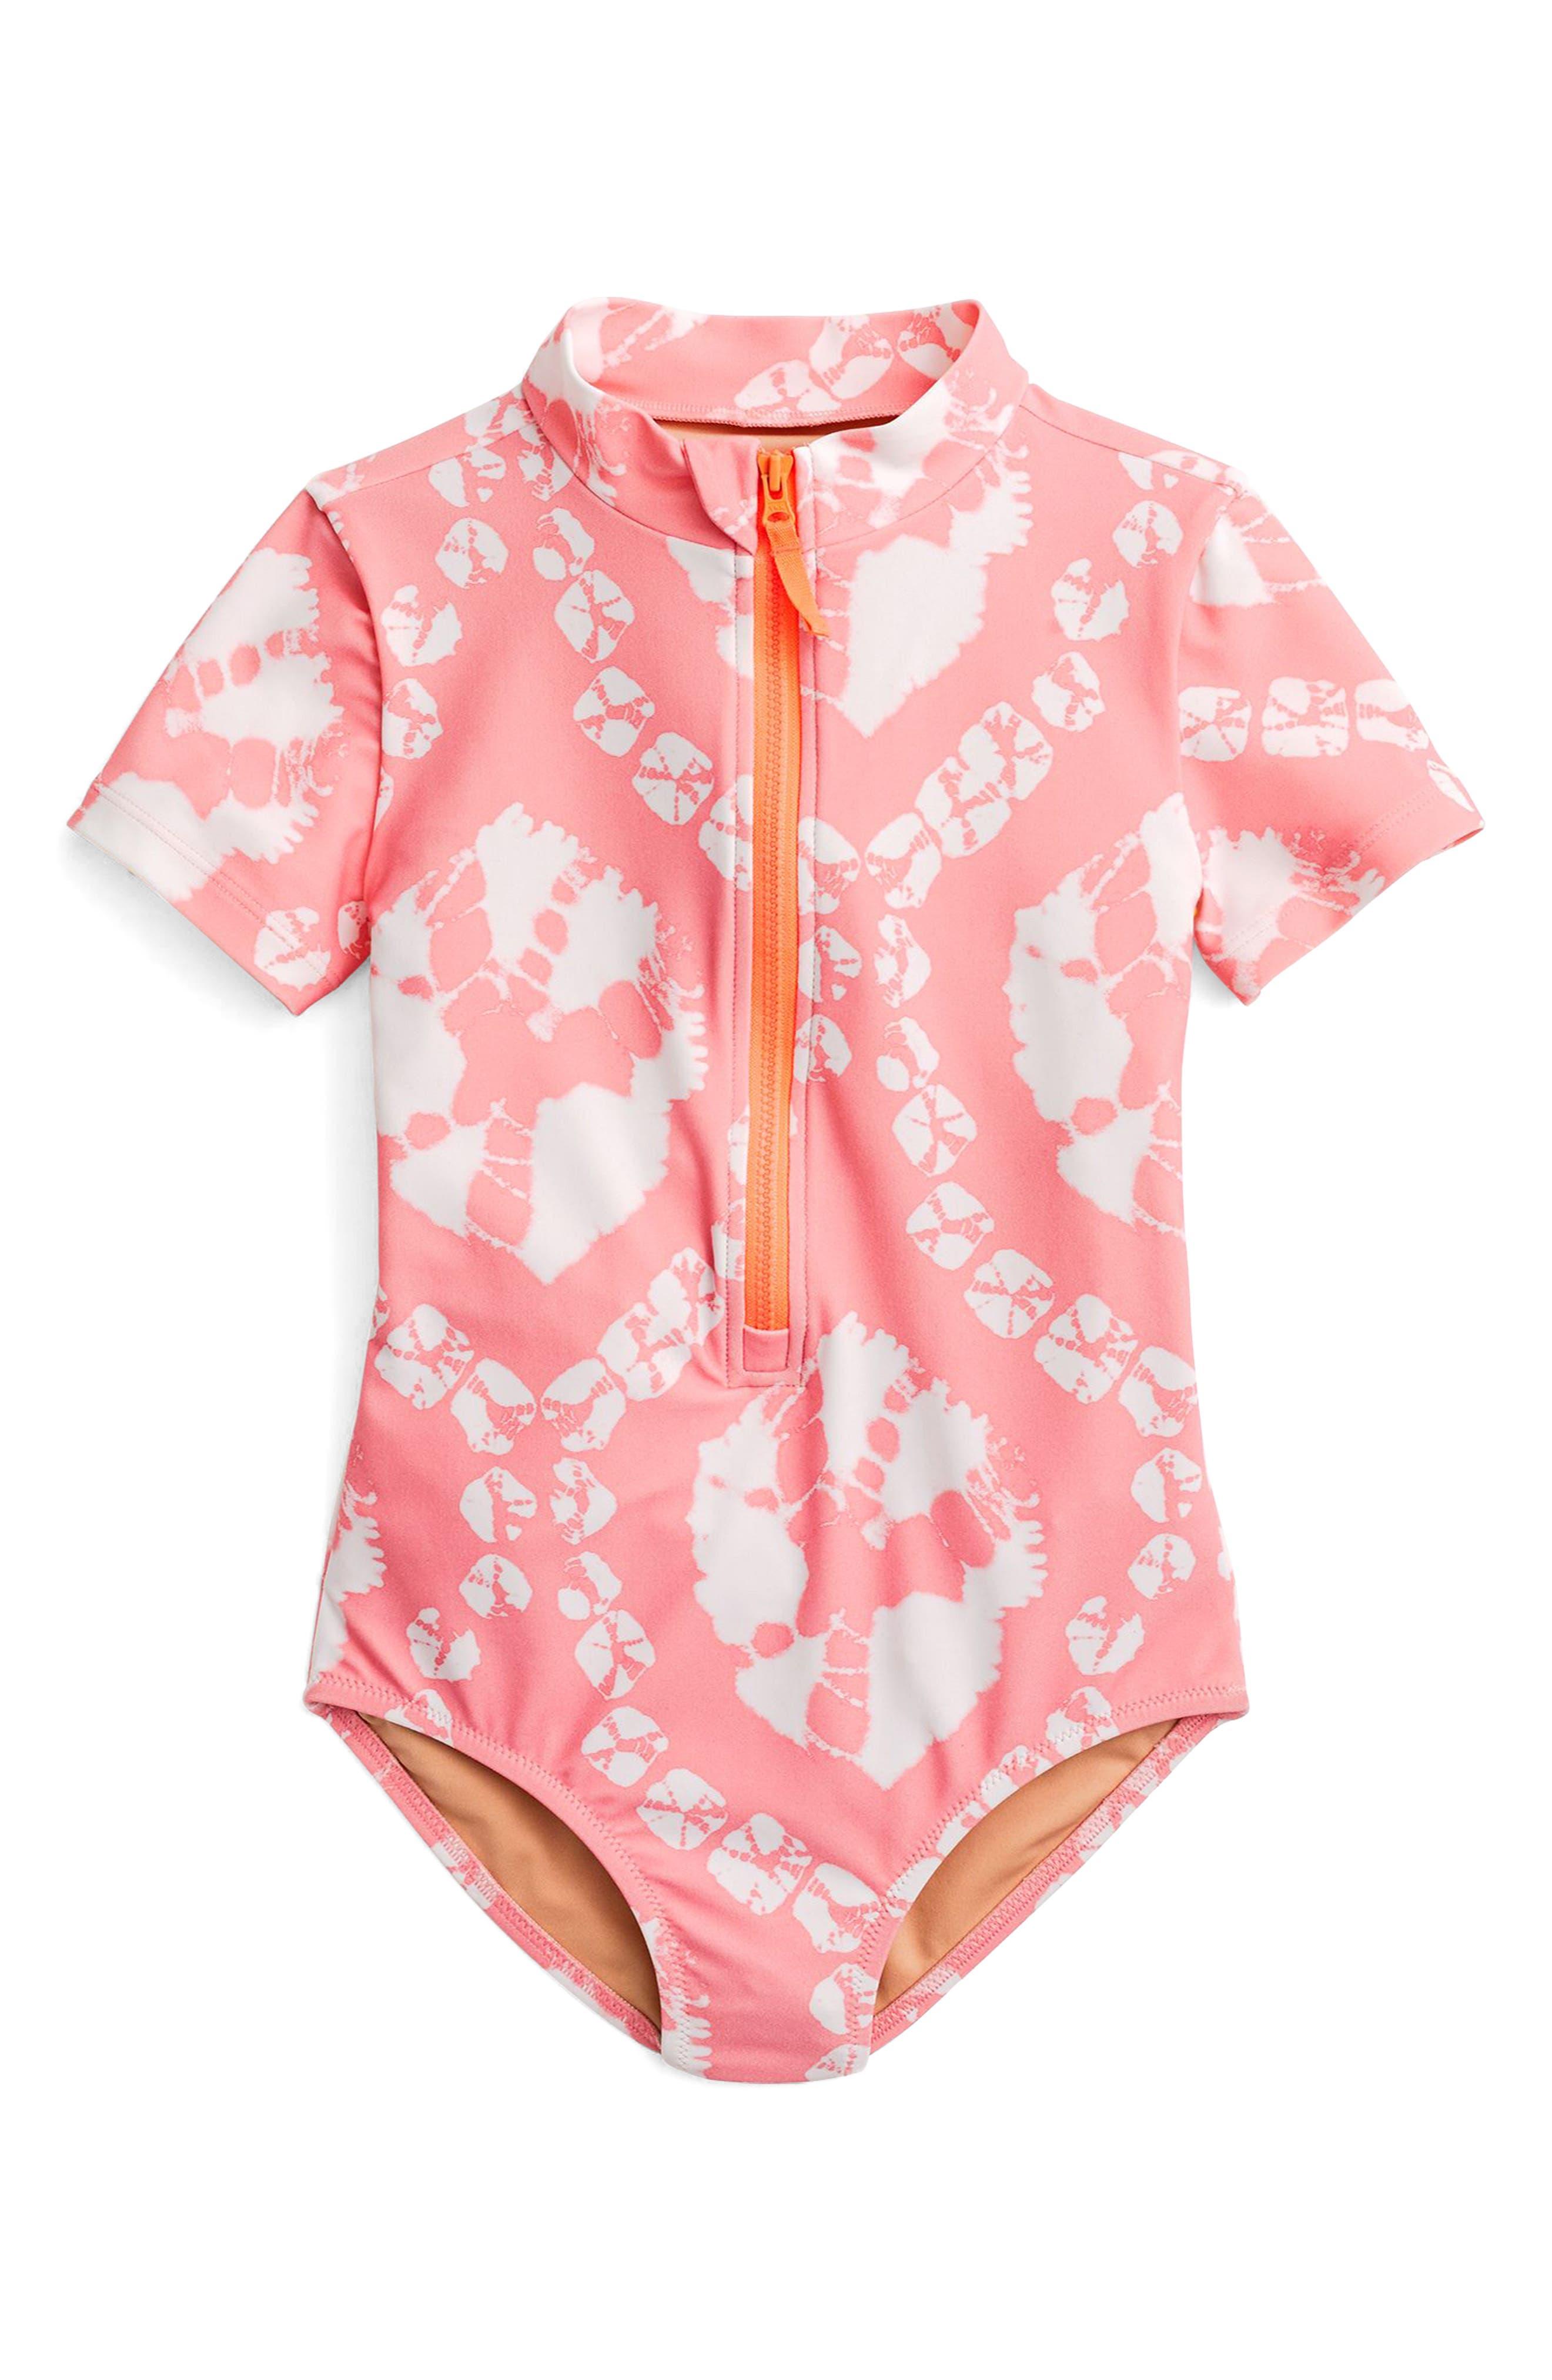 Tie Dye One-Piece Rashguard Swimsuit,                         Main,                         color, Pink Orange Multi Ka3139